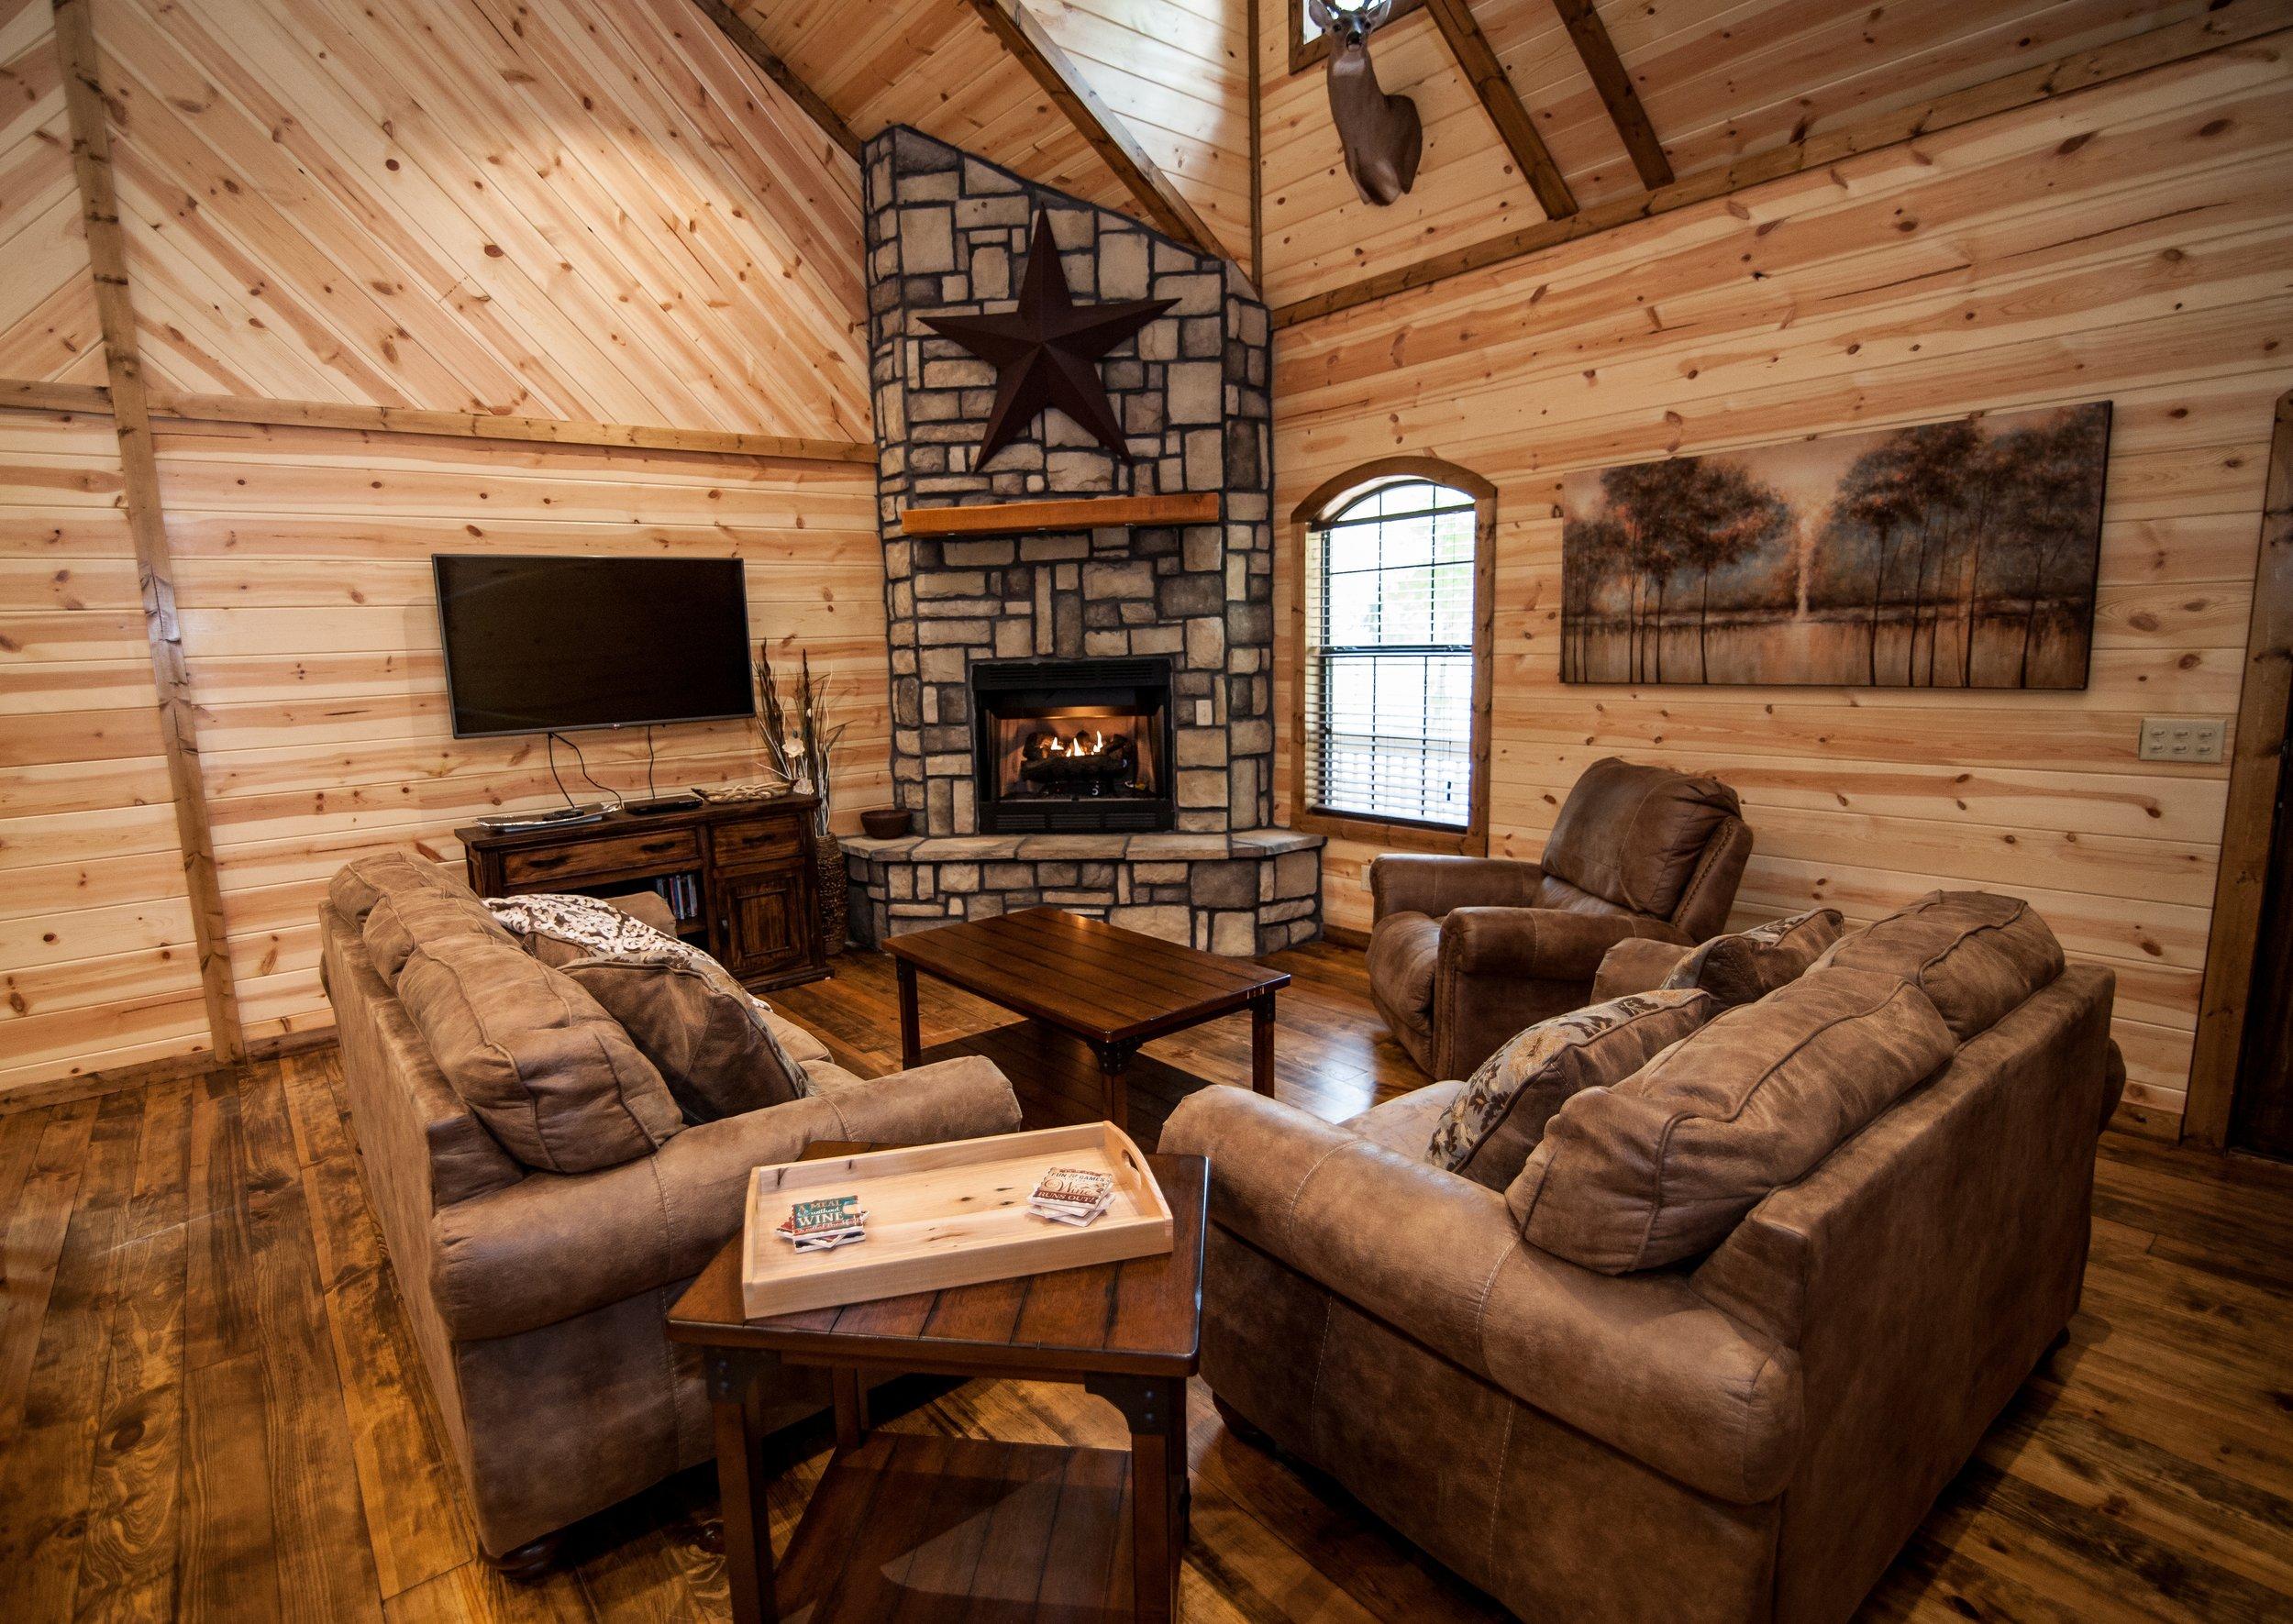 2 big Living Room - Fireplace.jpg.jpg